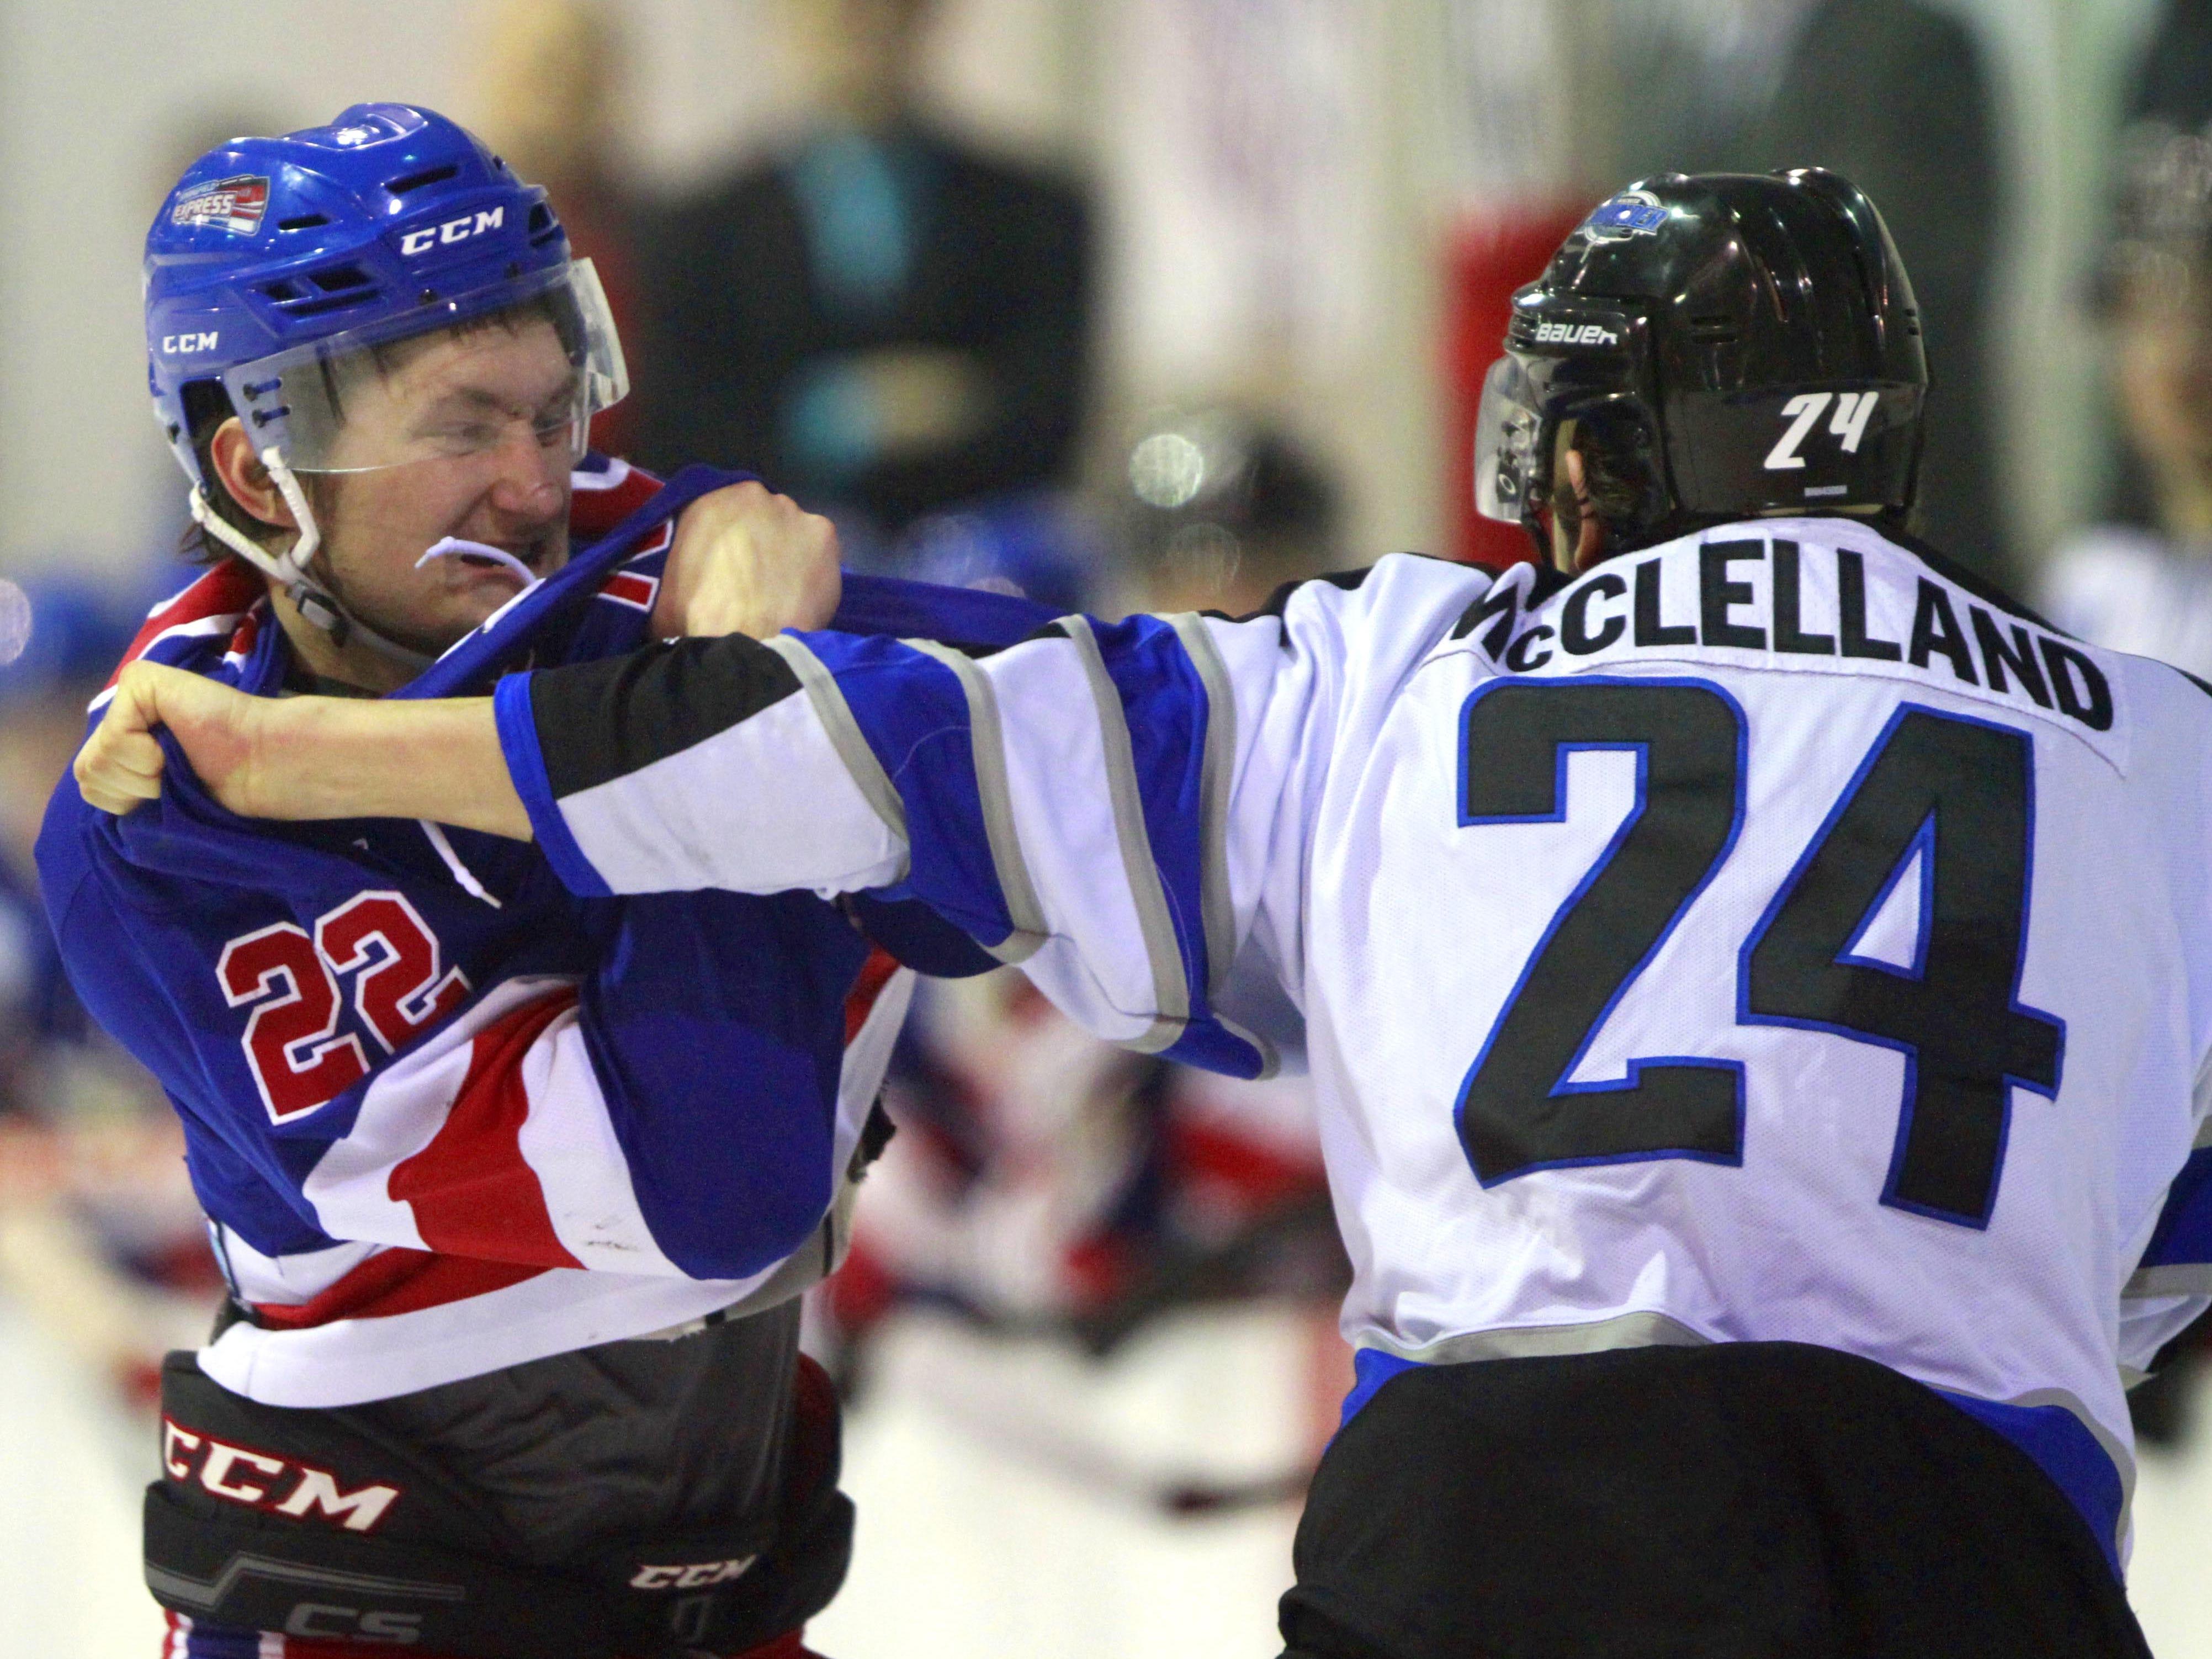 Springfield Express player David Higgs fights Wichita Jr. Thunder player Jack McClelland at the Mediacom Ice Park on Friday, Feb. 13, 2015.